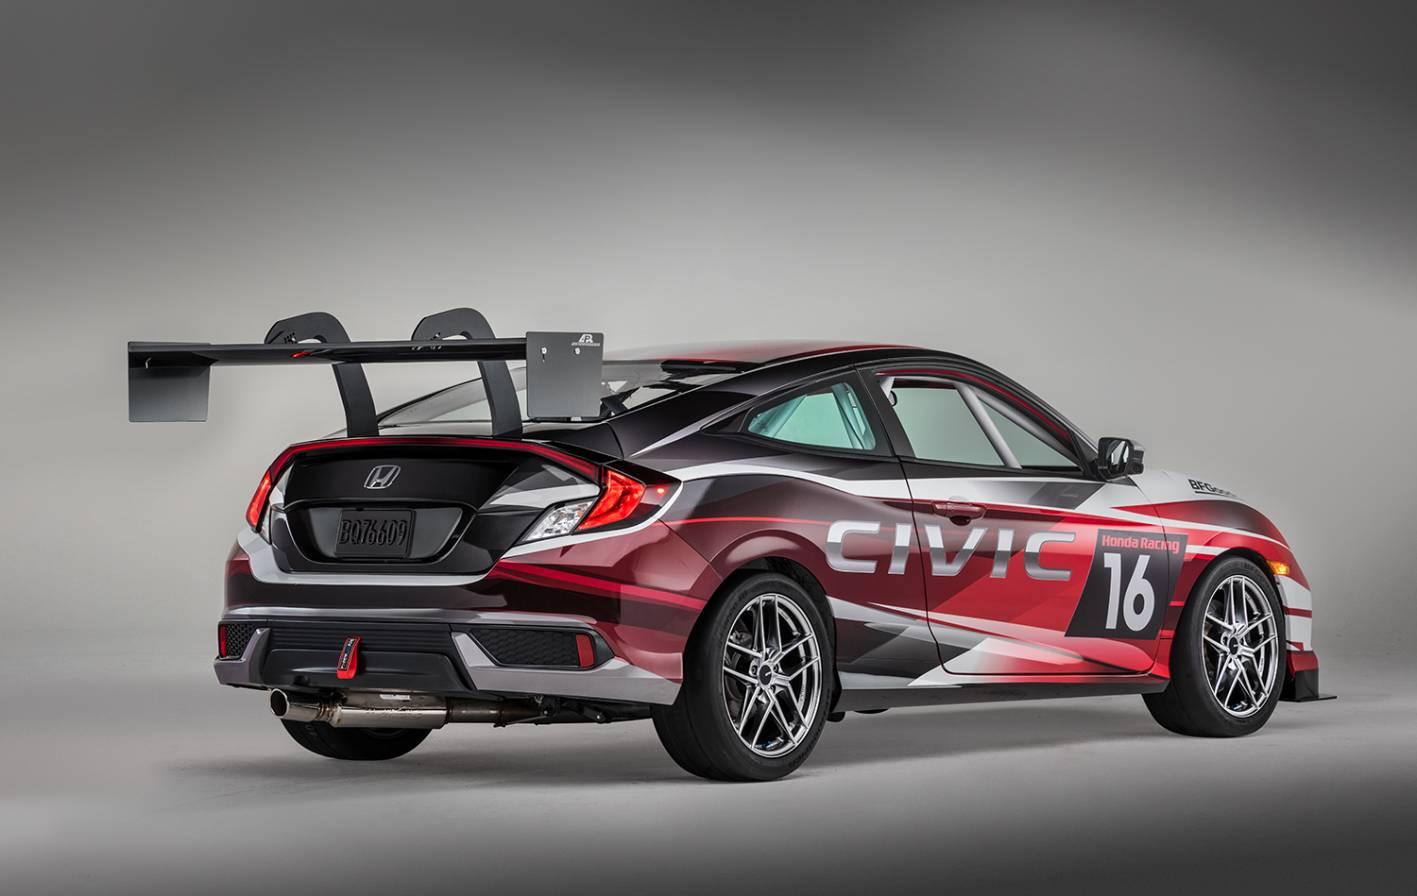 Customised Civics to grace Honda's SEMA booth - ForceGT.com